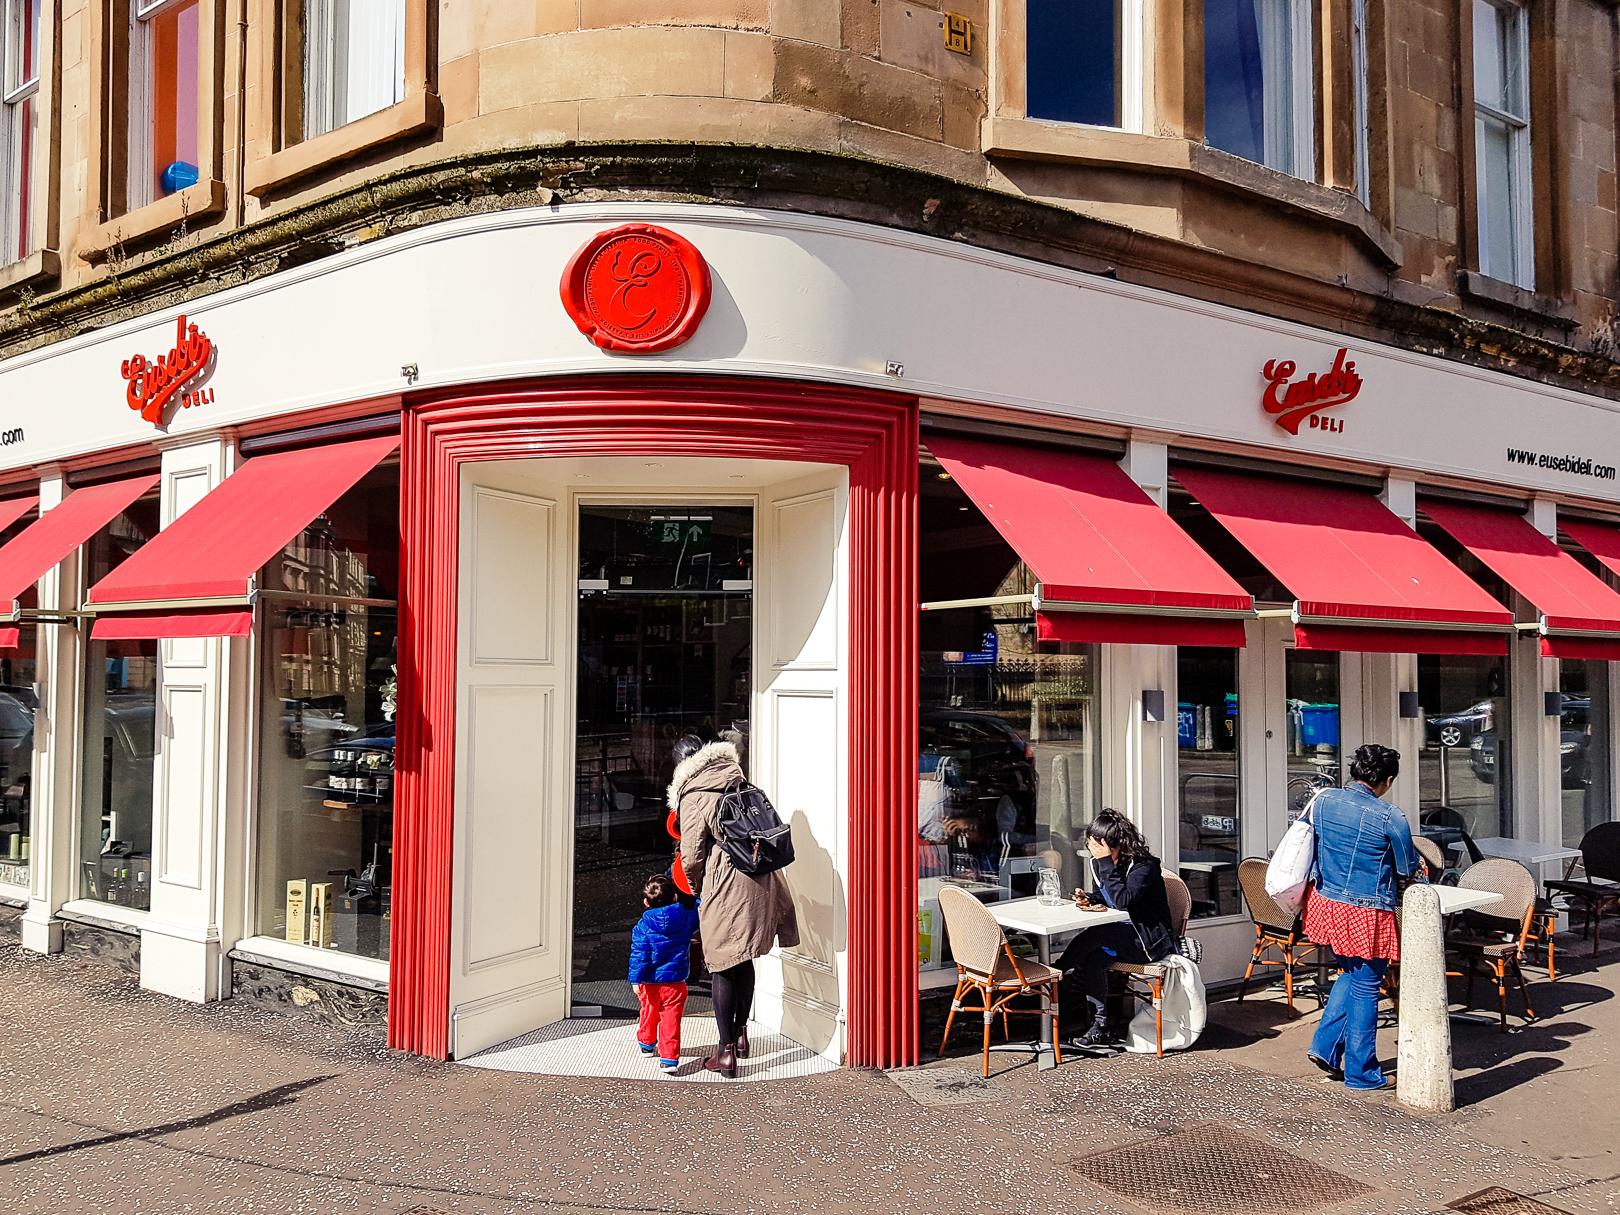 The exterior of Eusebi Deli in Glasgow.